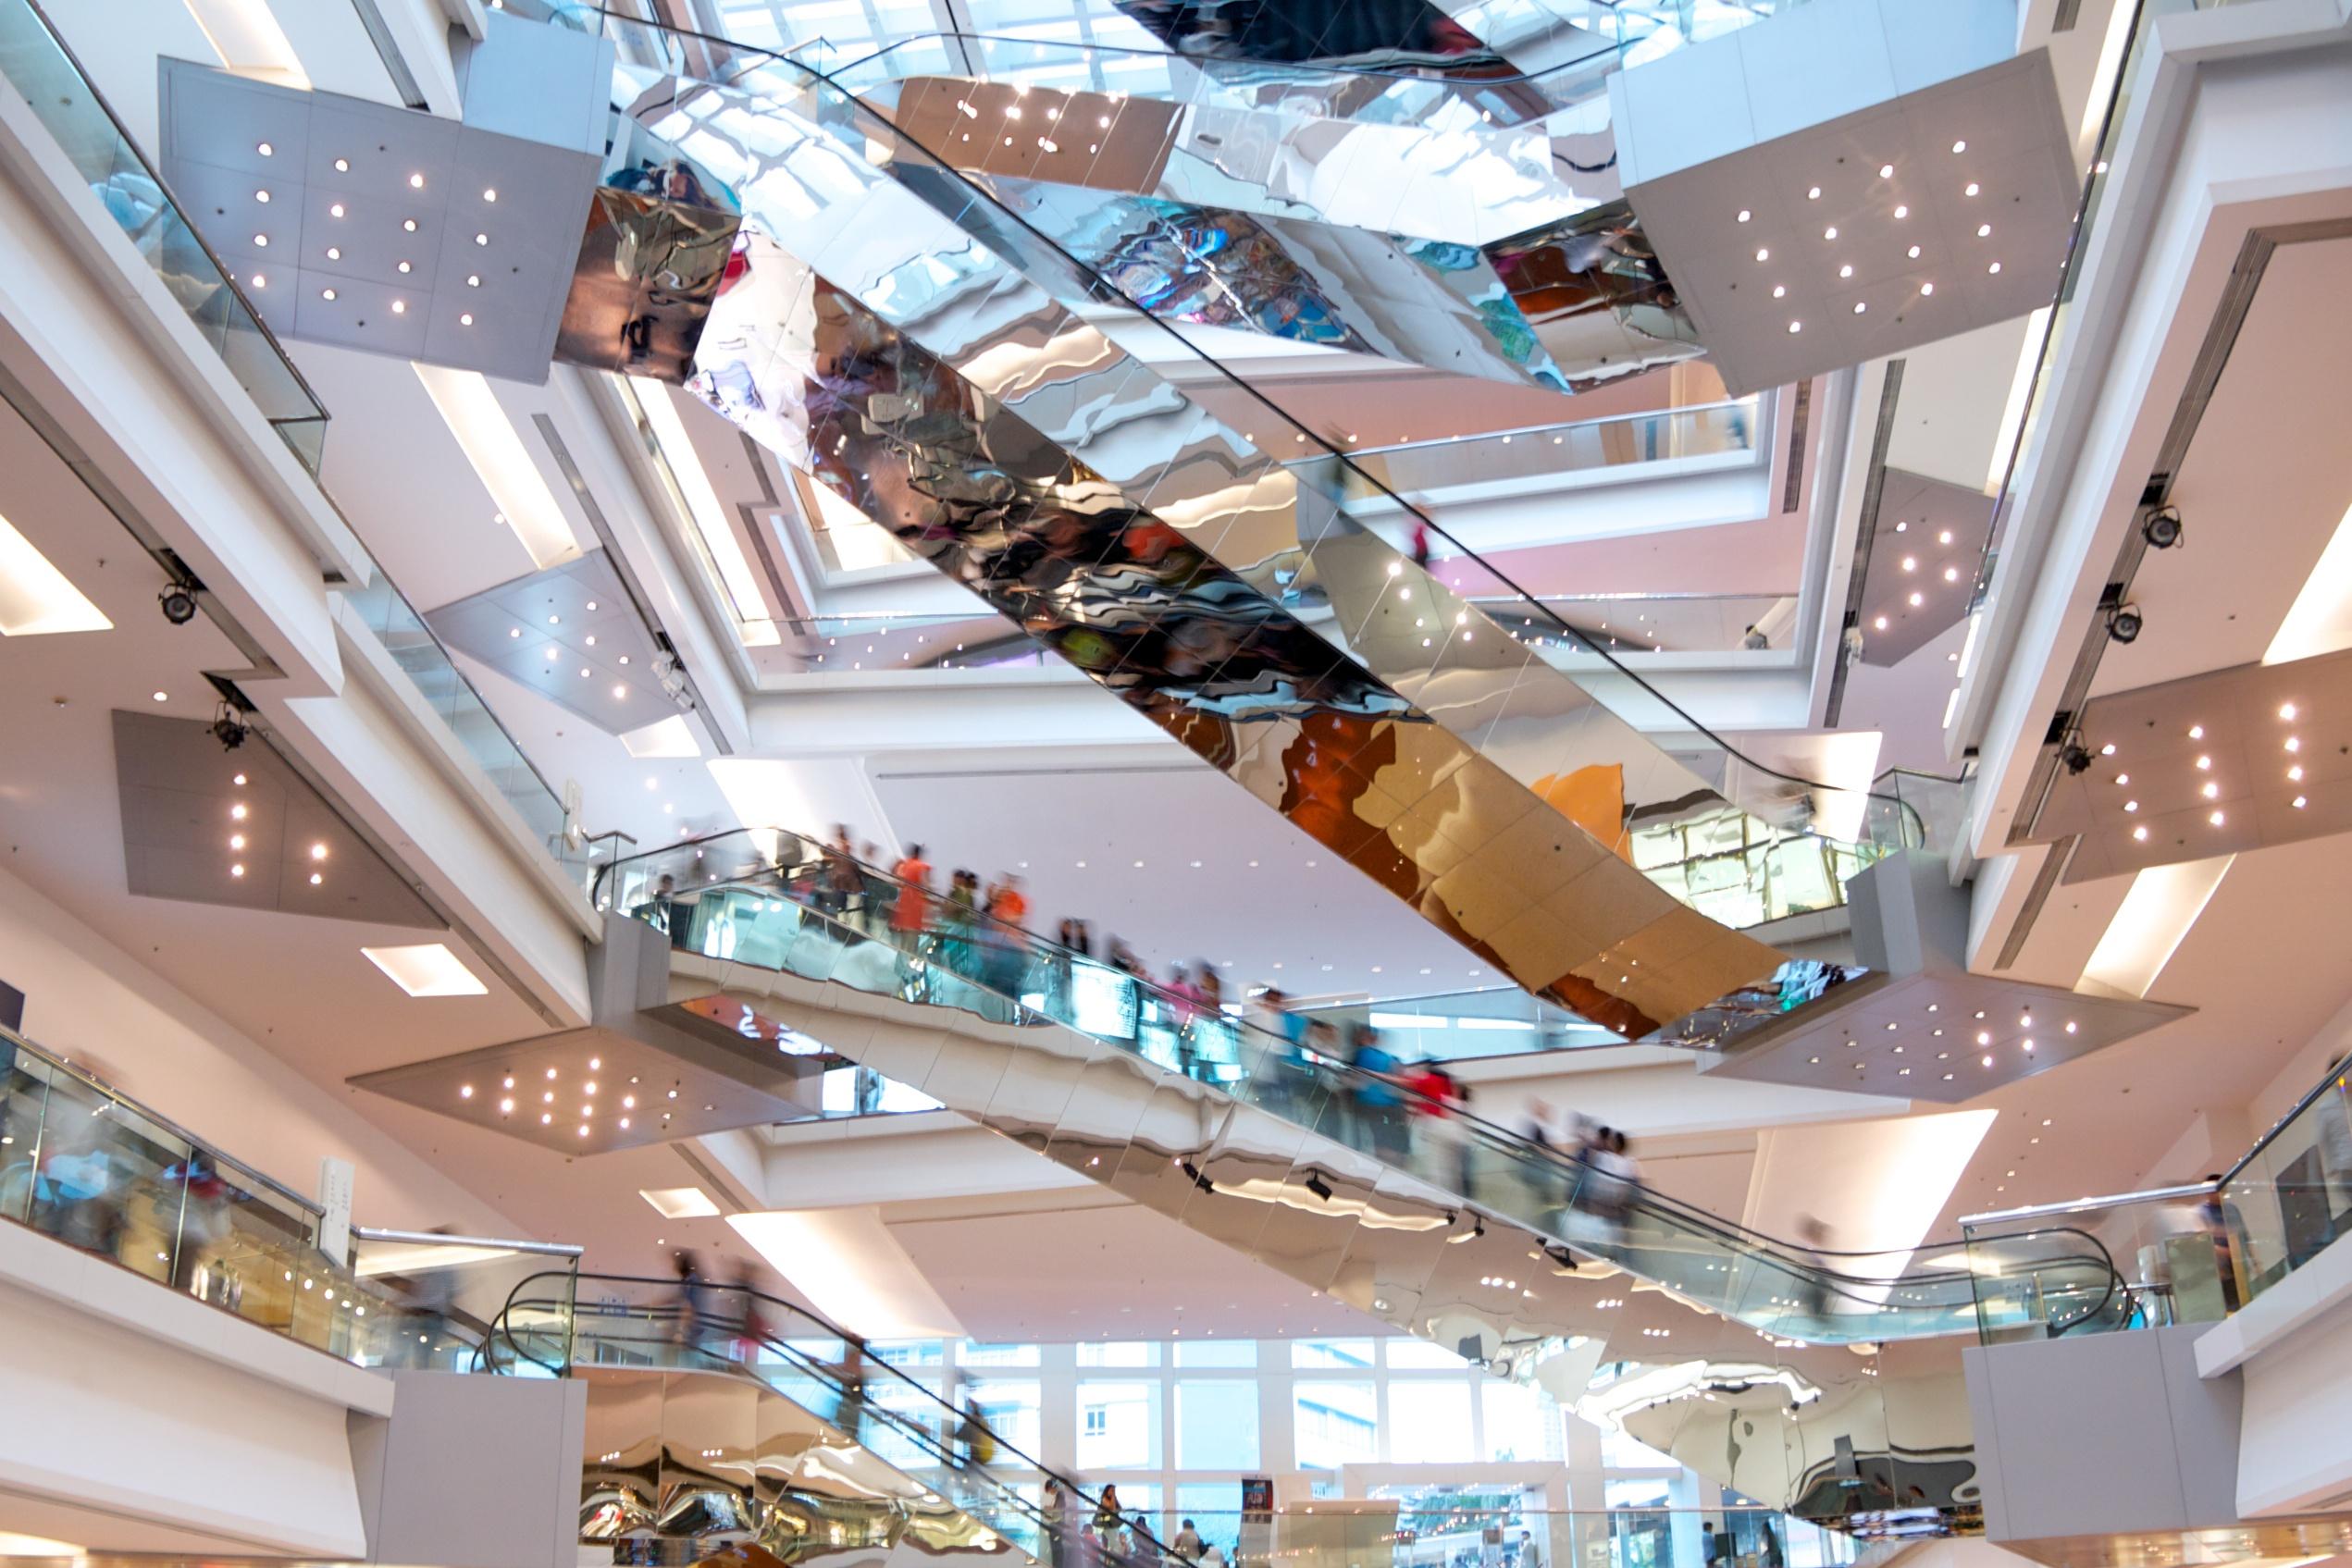 Shopping at boutiques and malls in Hong Kong